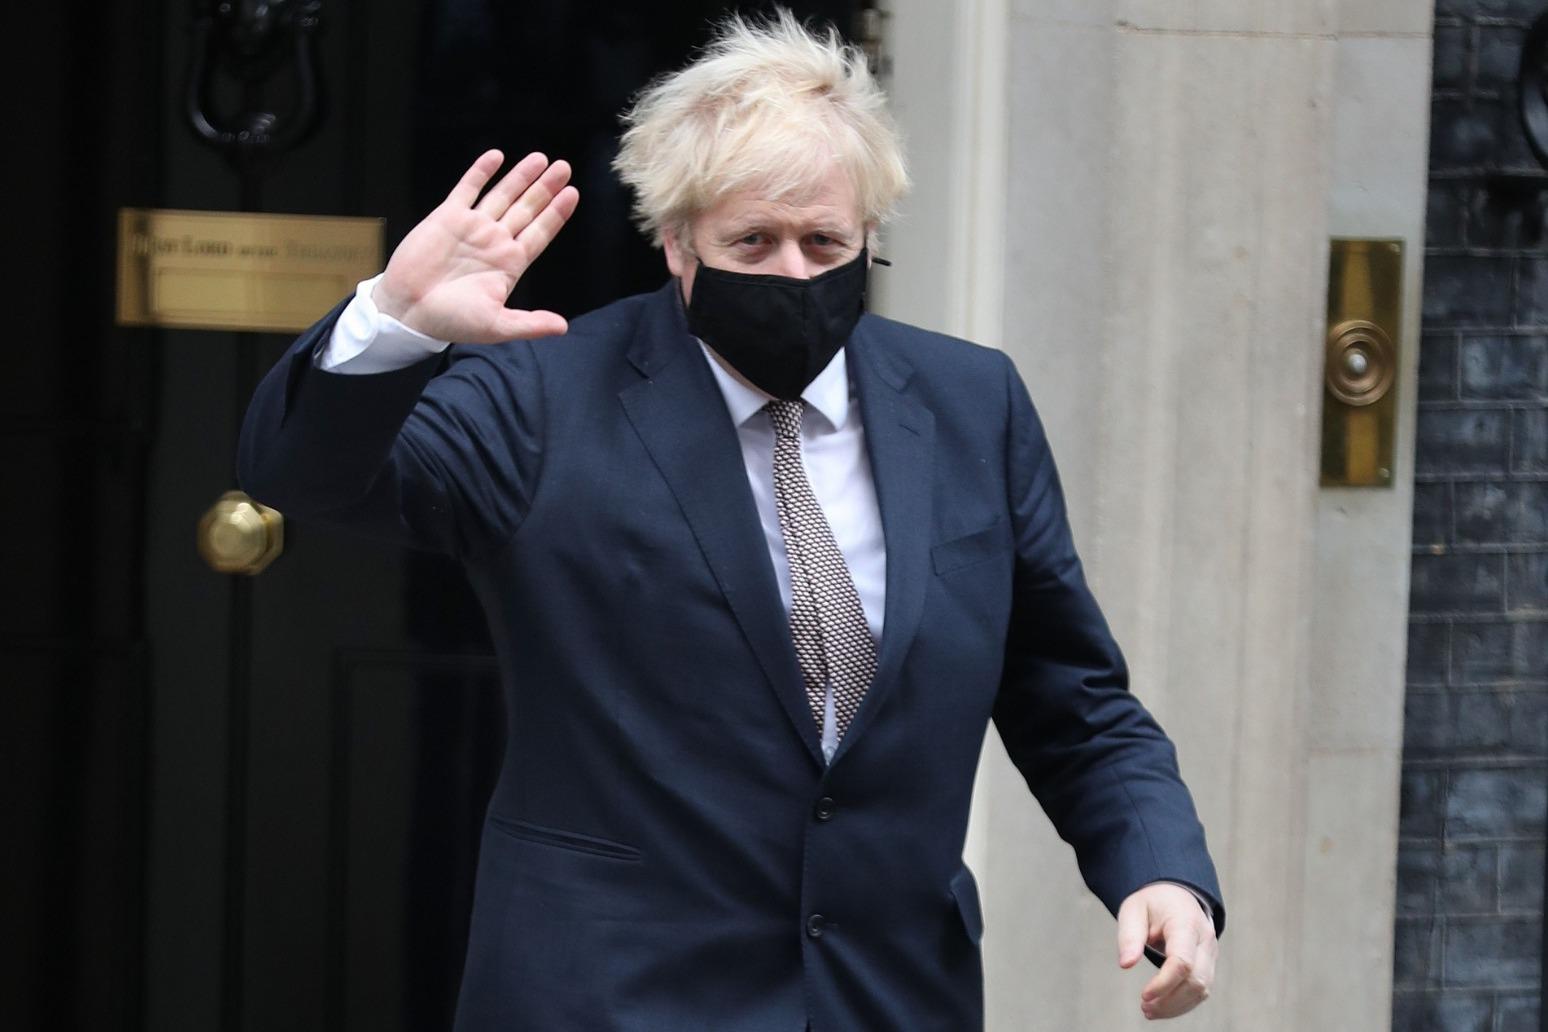 PM announces £20m to boost medicine manufacturing in UK